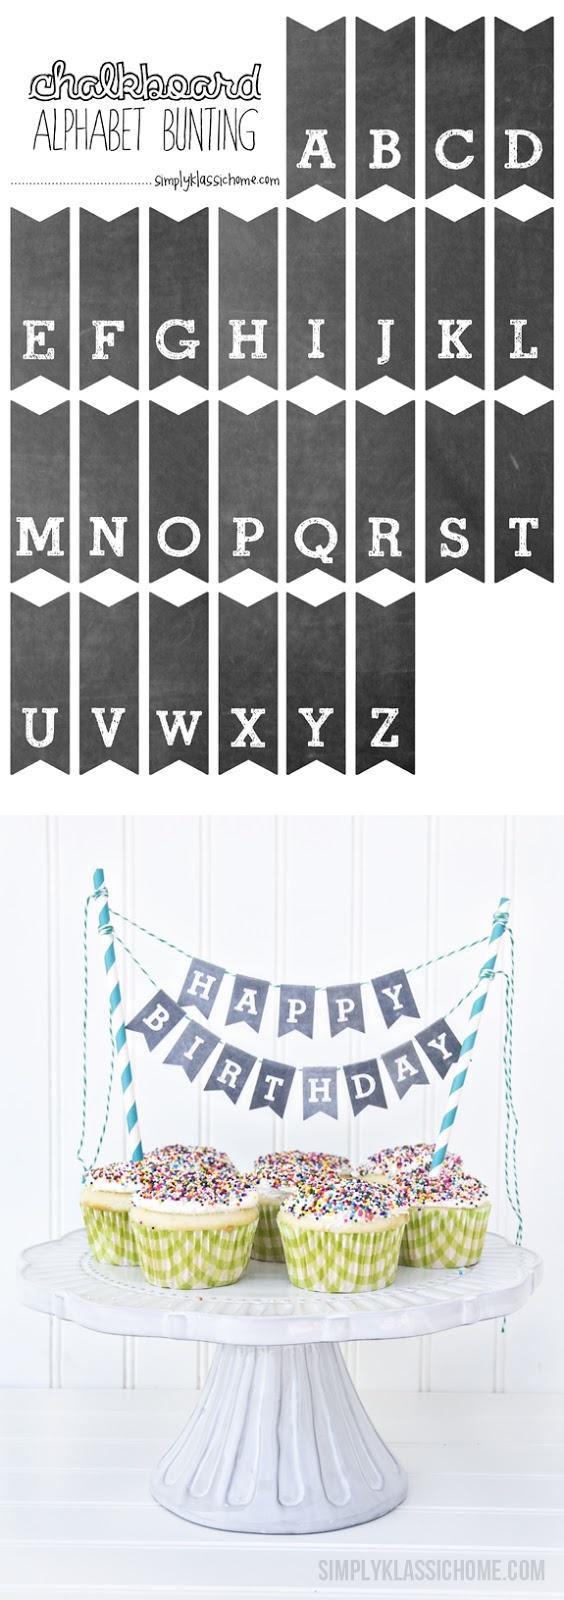 Printable Chalkboard Letters Cake Bunting - Yellow Bliss Road - Free Printable Cake Bunting Template